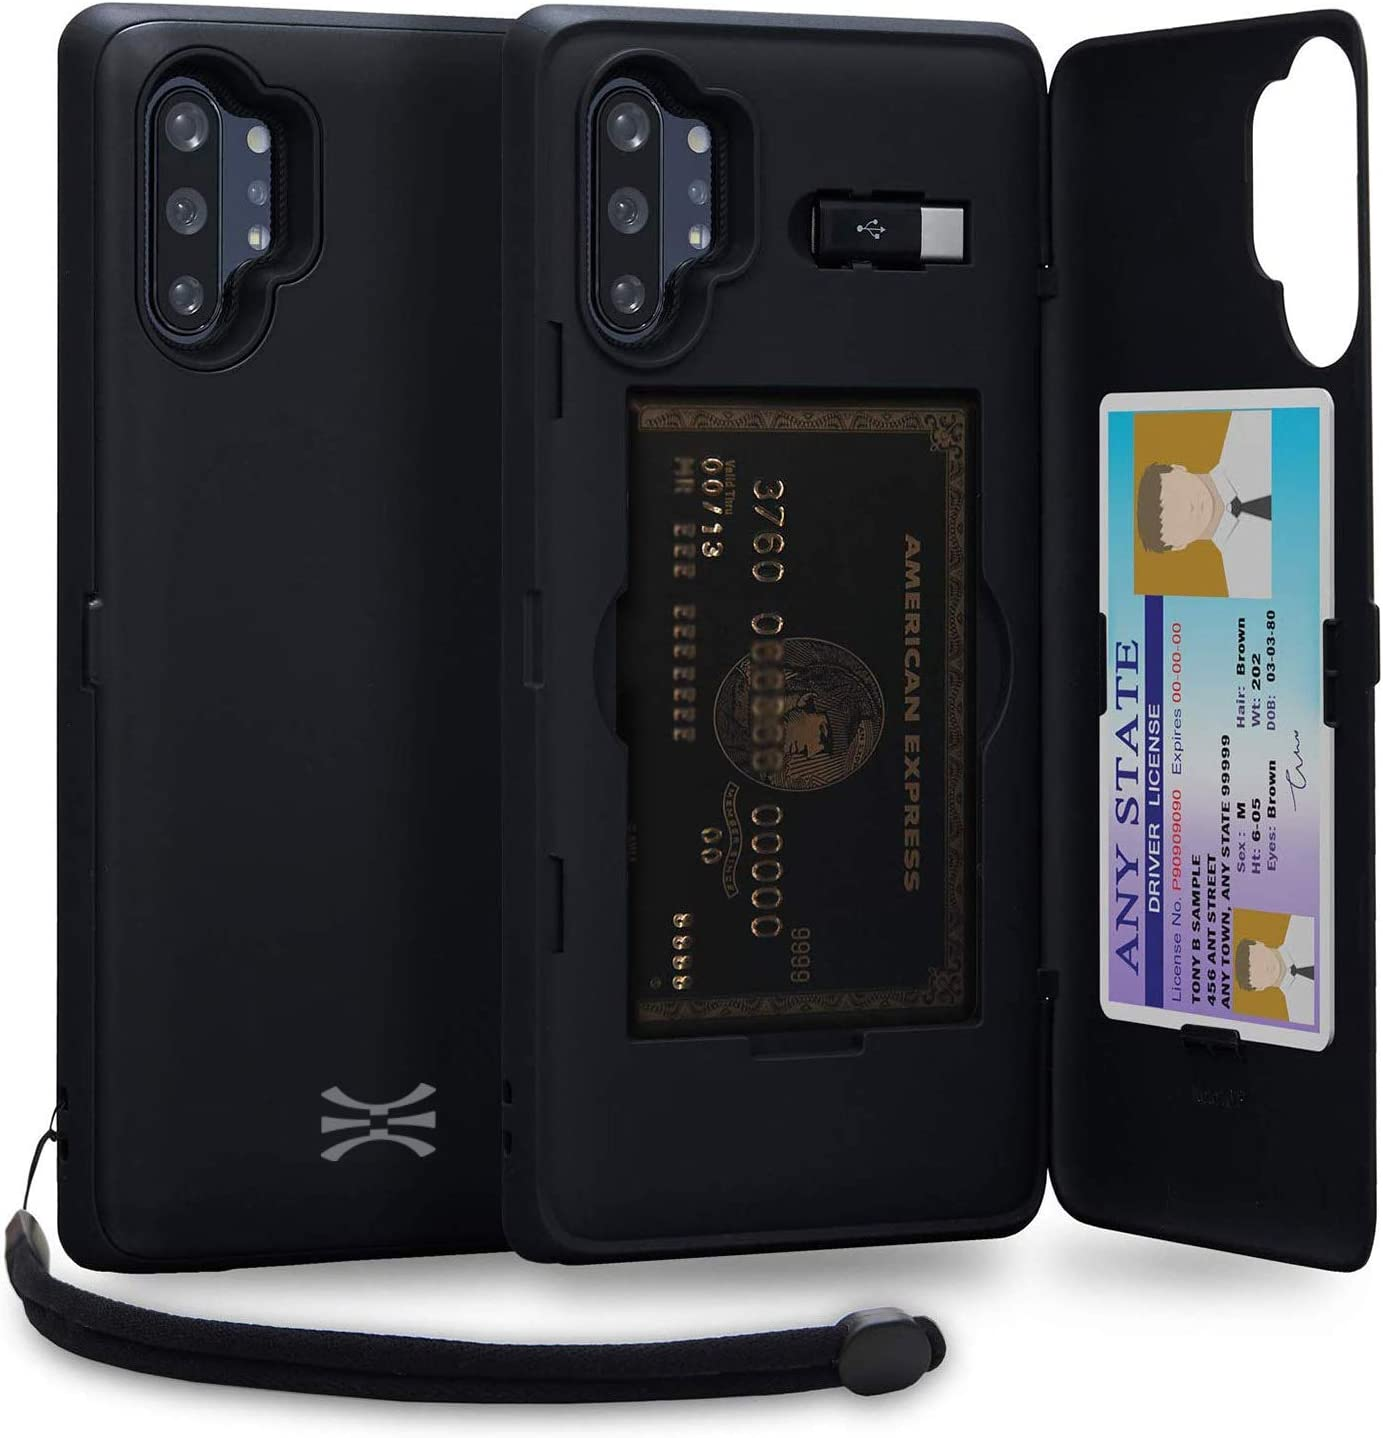 Funda cartera negra con tarjetero oculto para Note 10 Plus